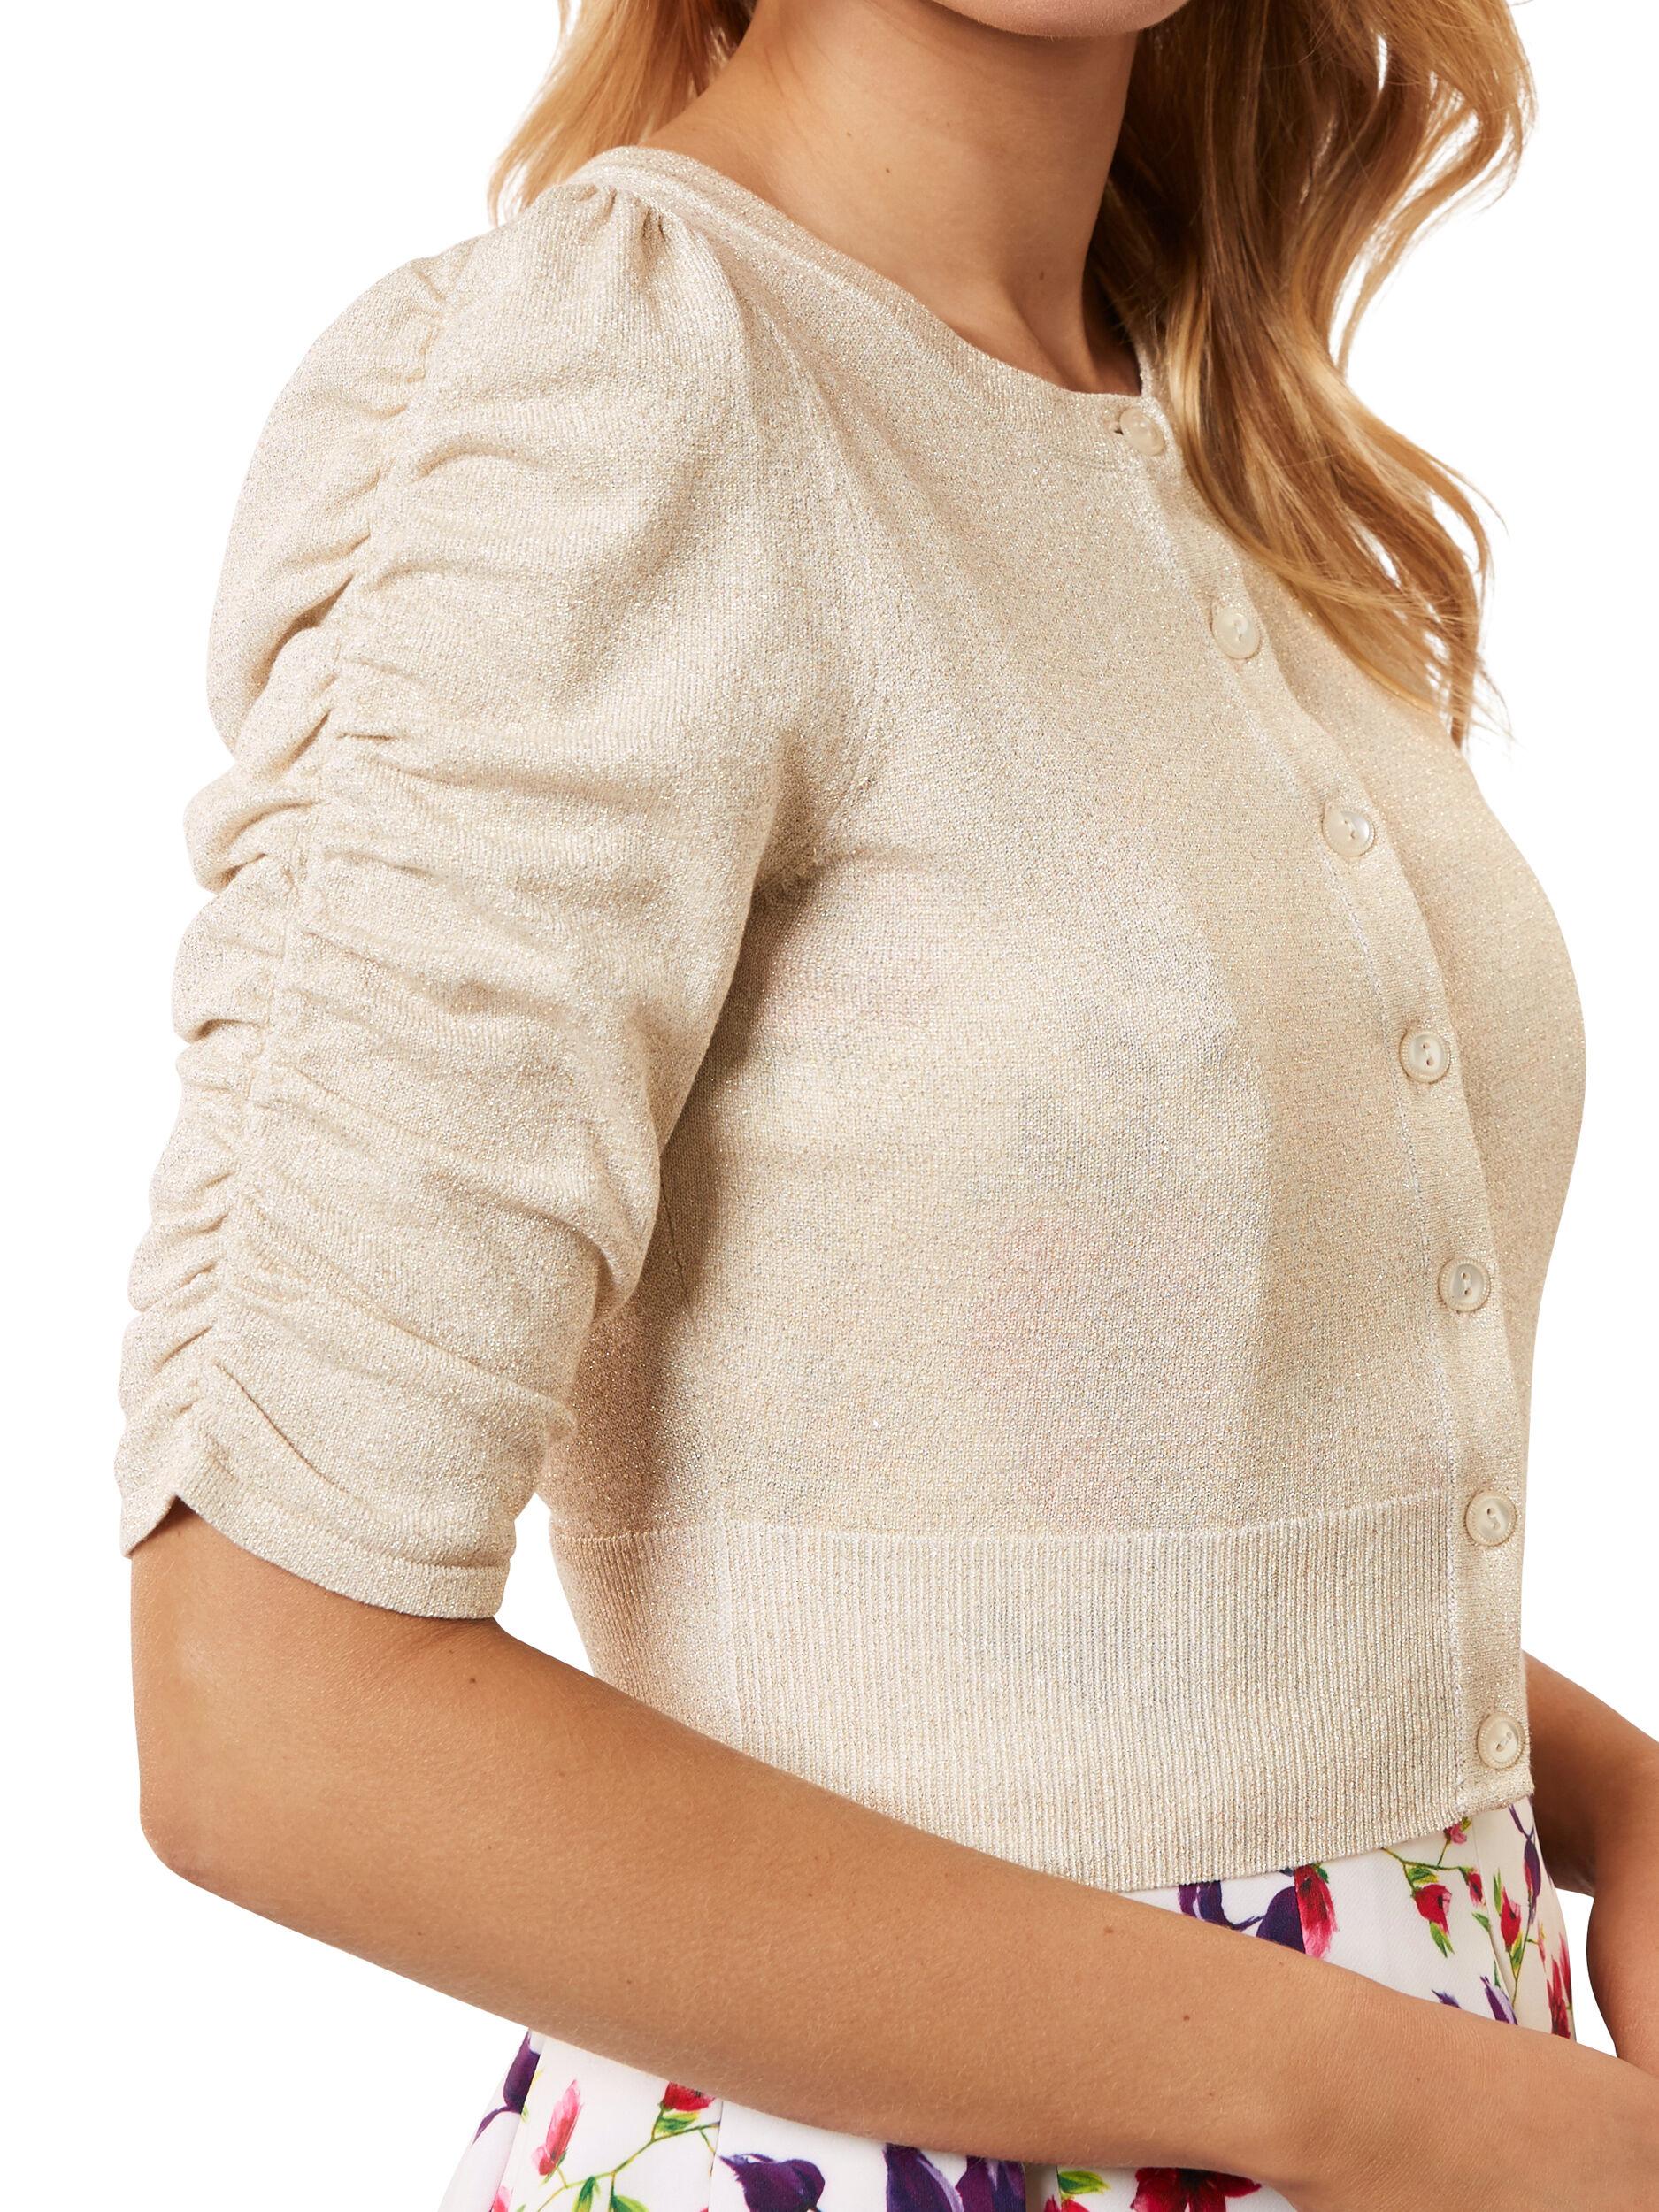 Lila Rose Shimmer Cardi